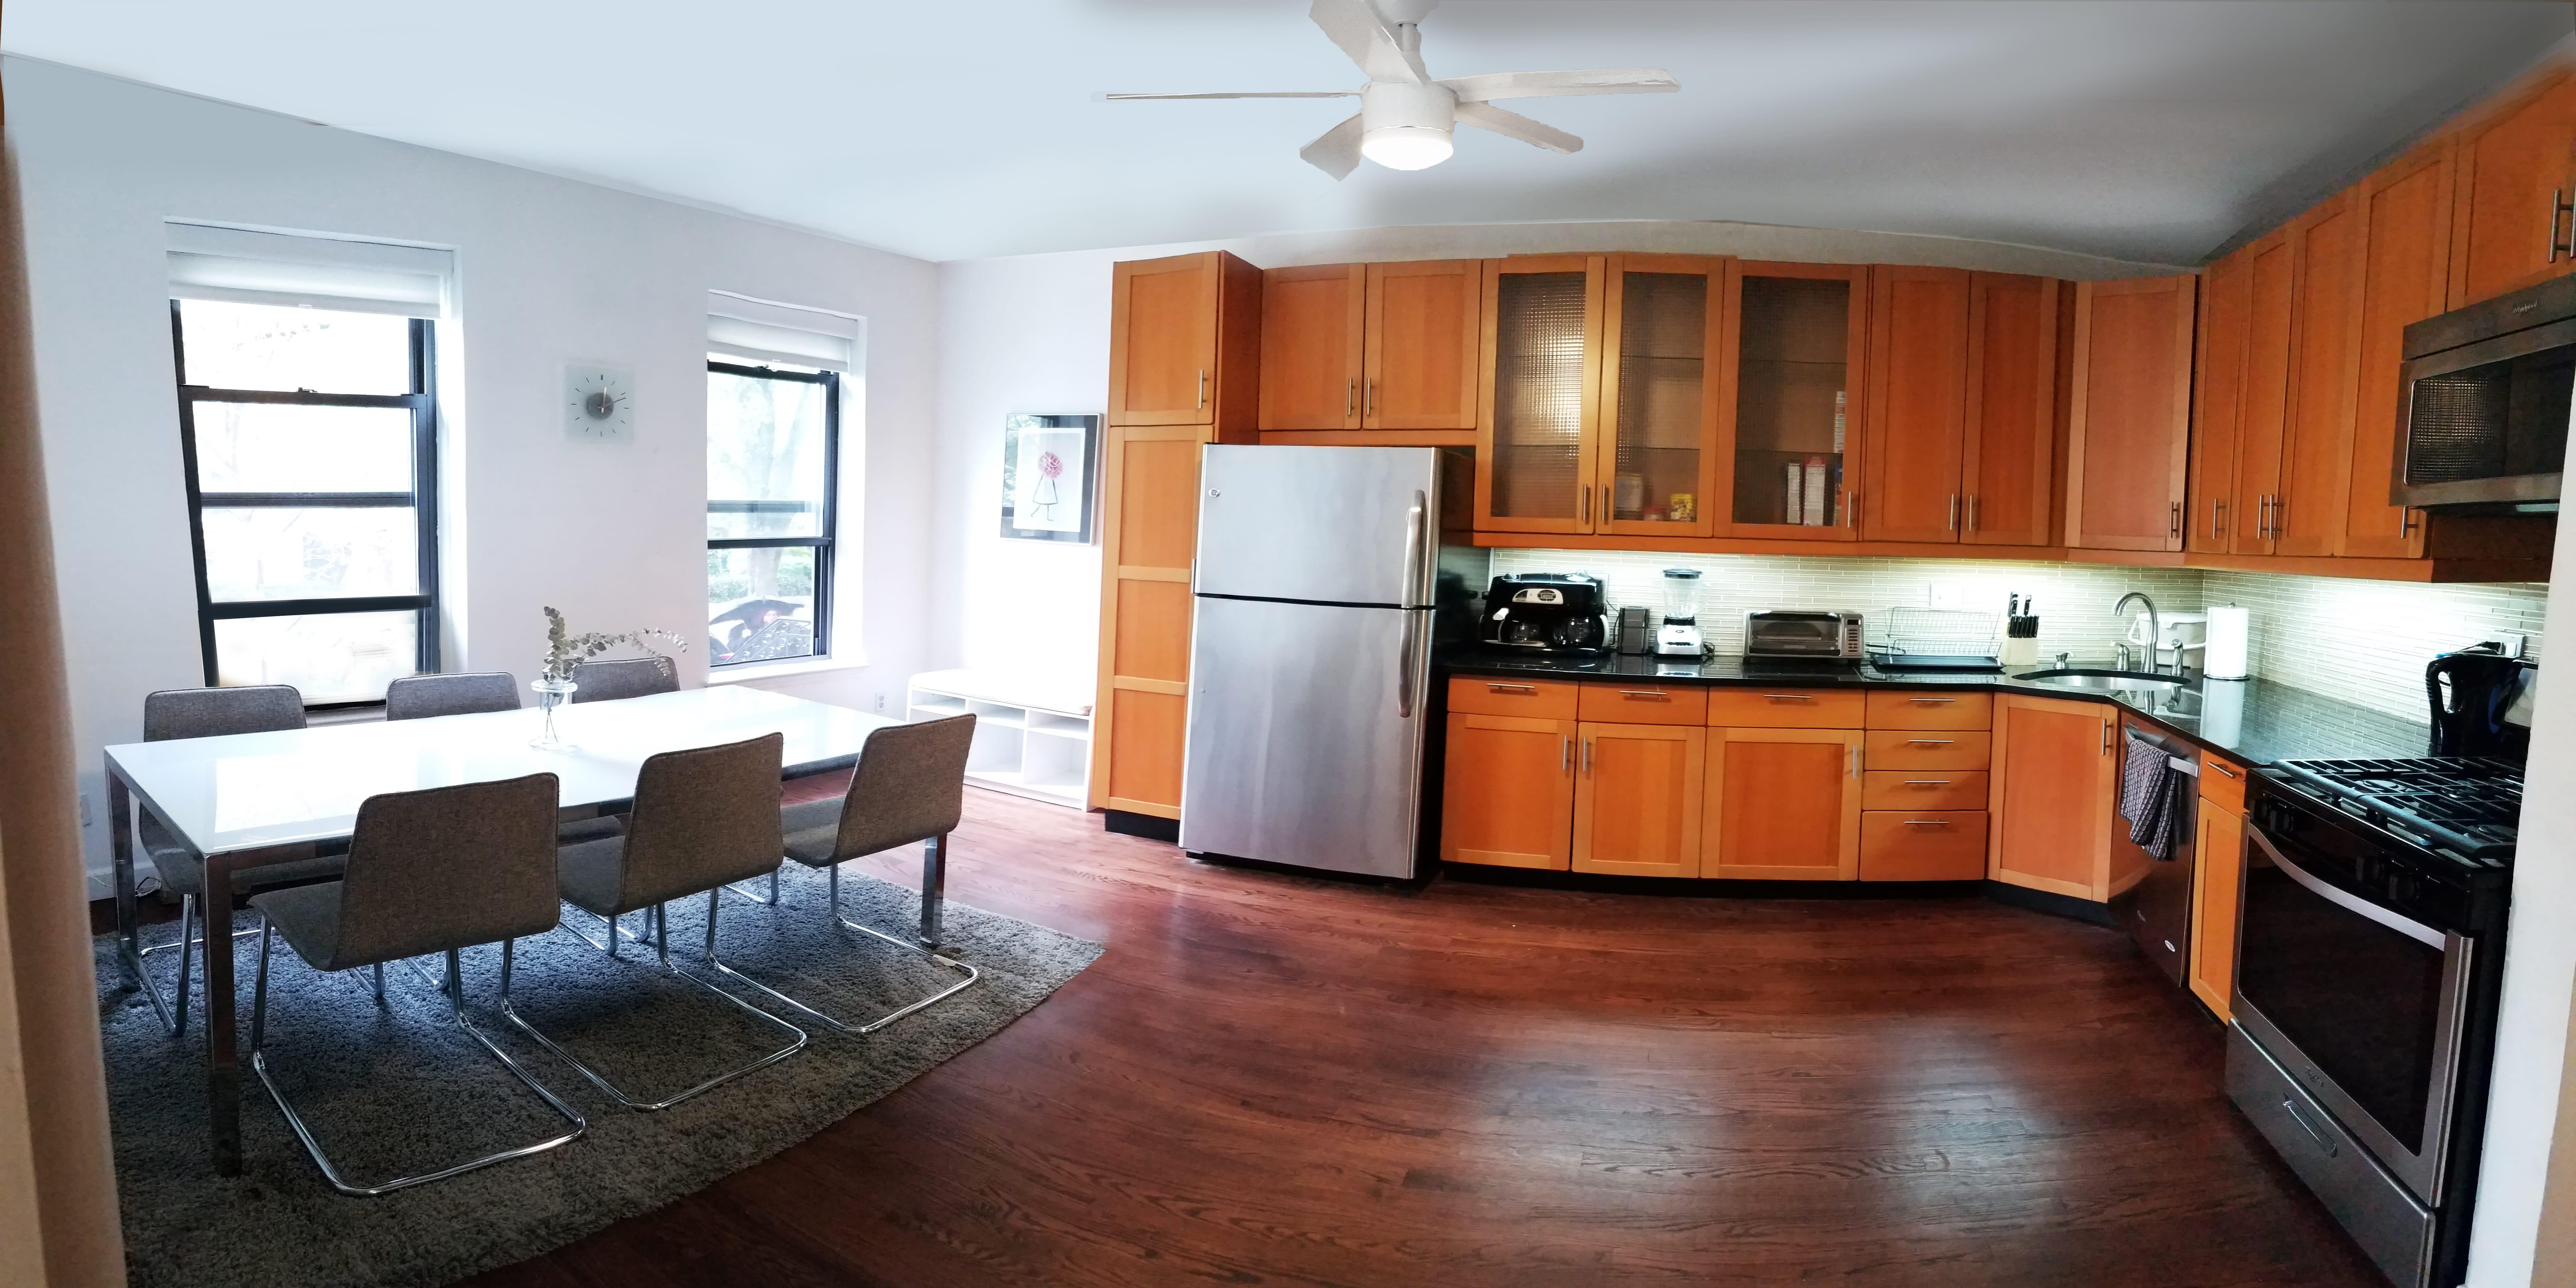 482 WARREN ST HOUSE, Brooklyn, NY 11217